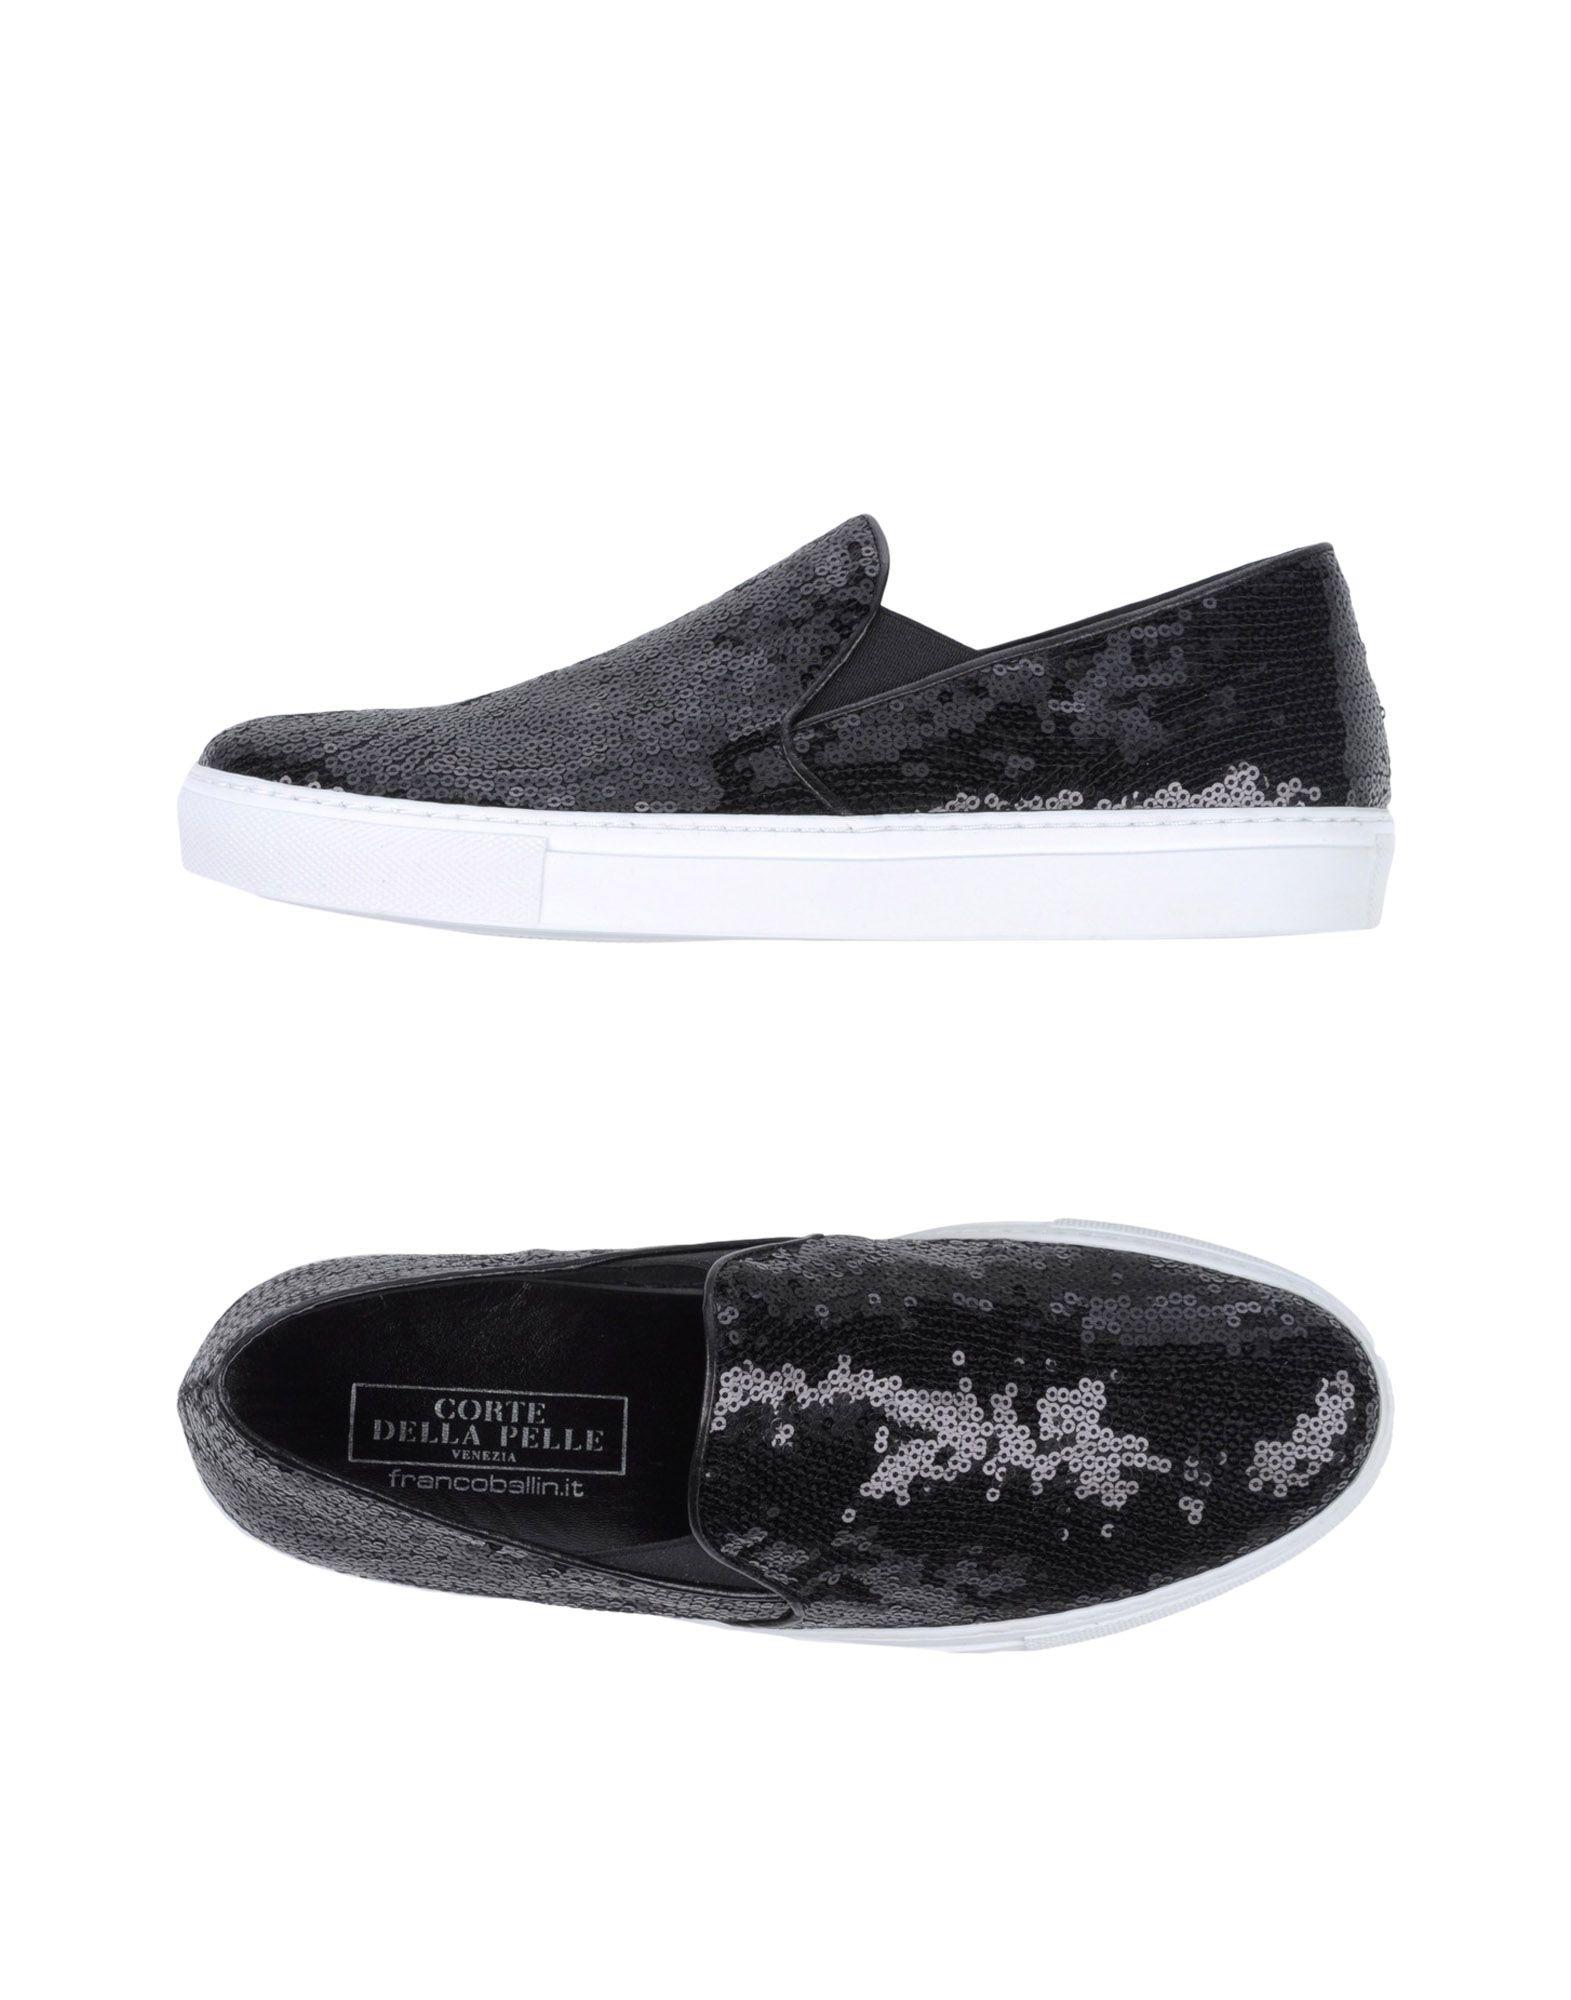 La Corte Della Pelle By Franco Ballin Sneakers Damen  11374791GG Gute Qualität beliebte Schuhe